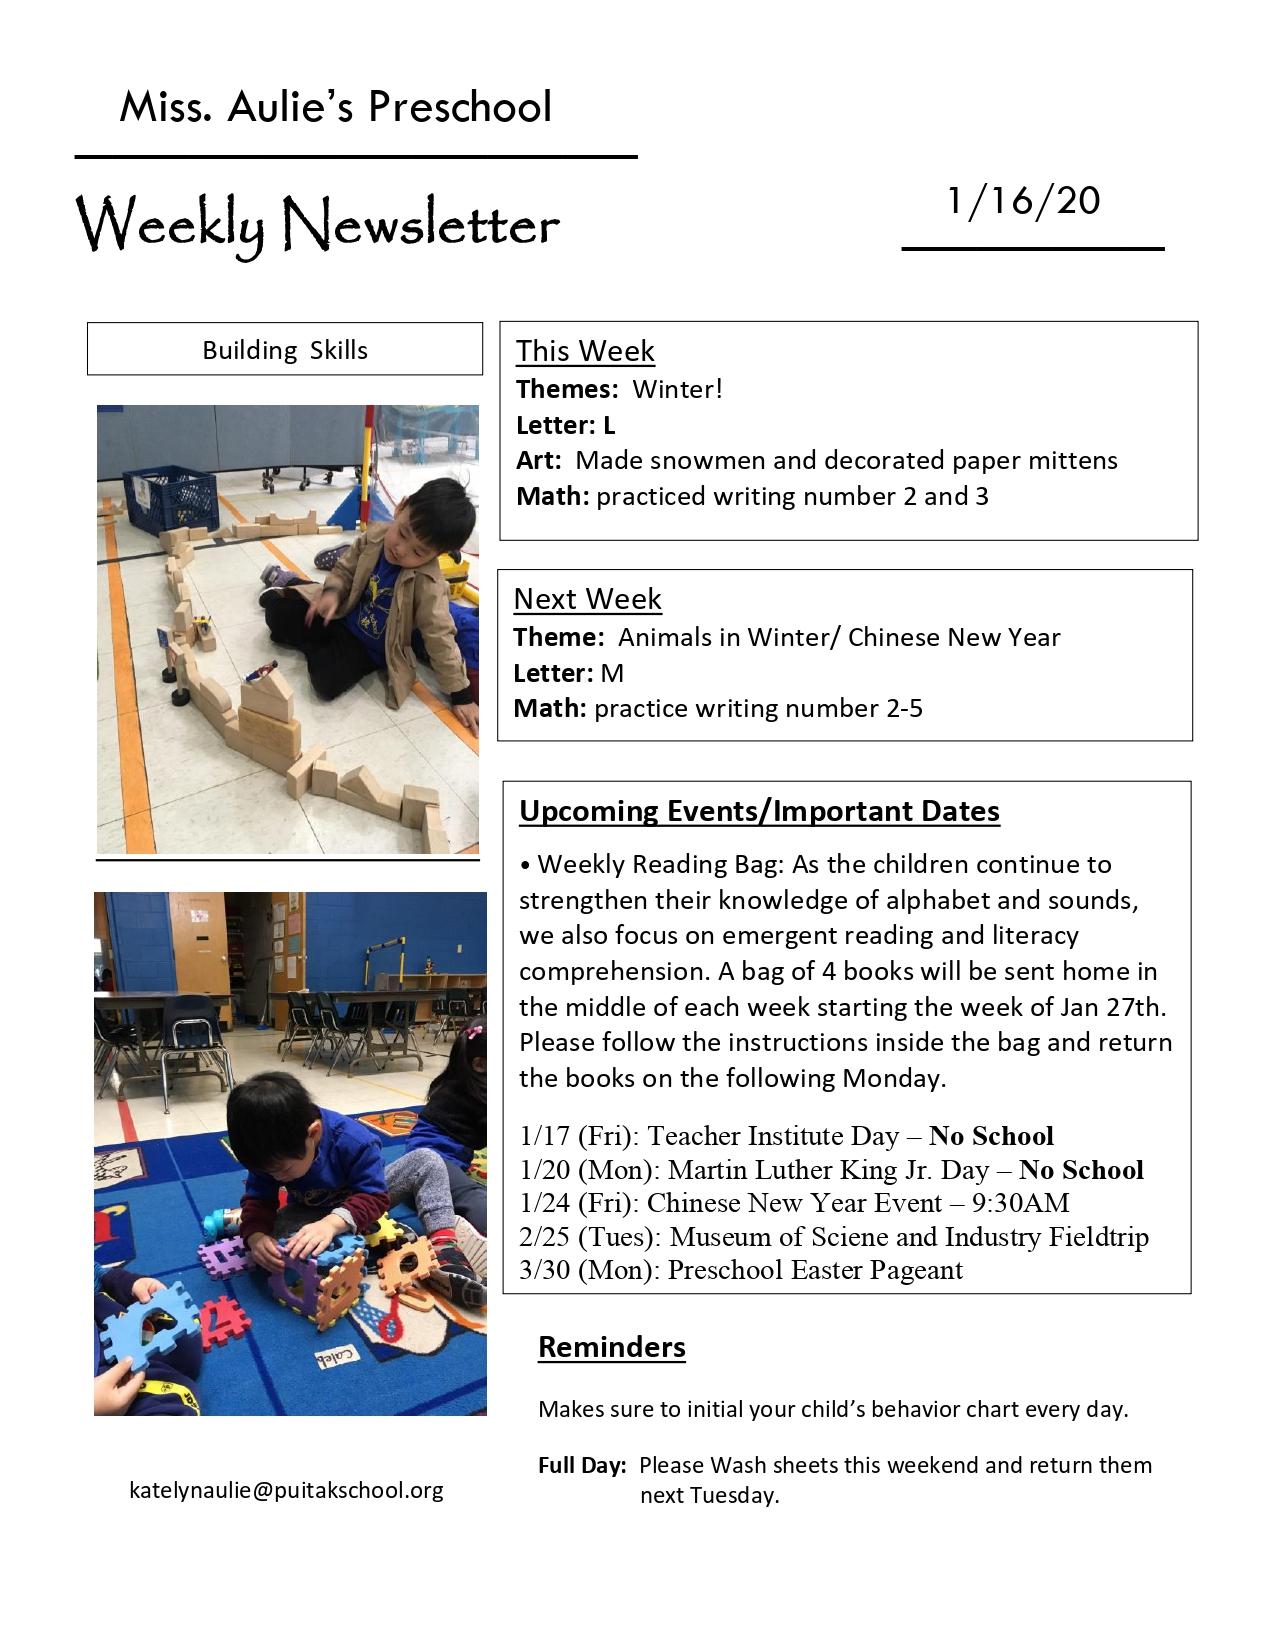 KatelynNewsletter2020January3rdWeek_page